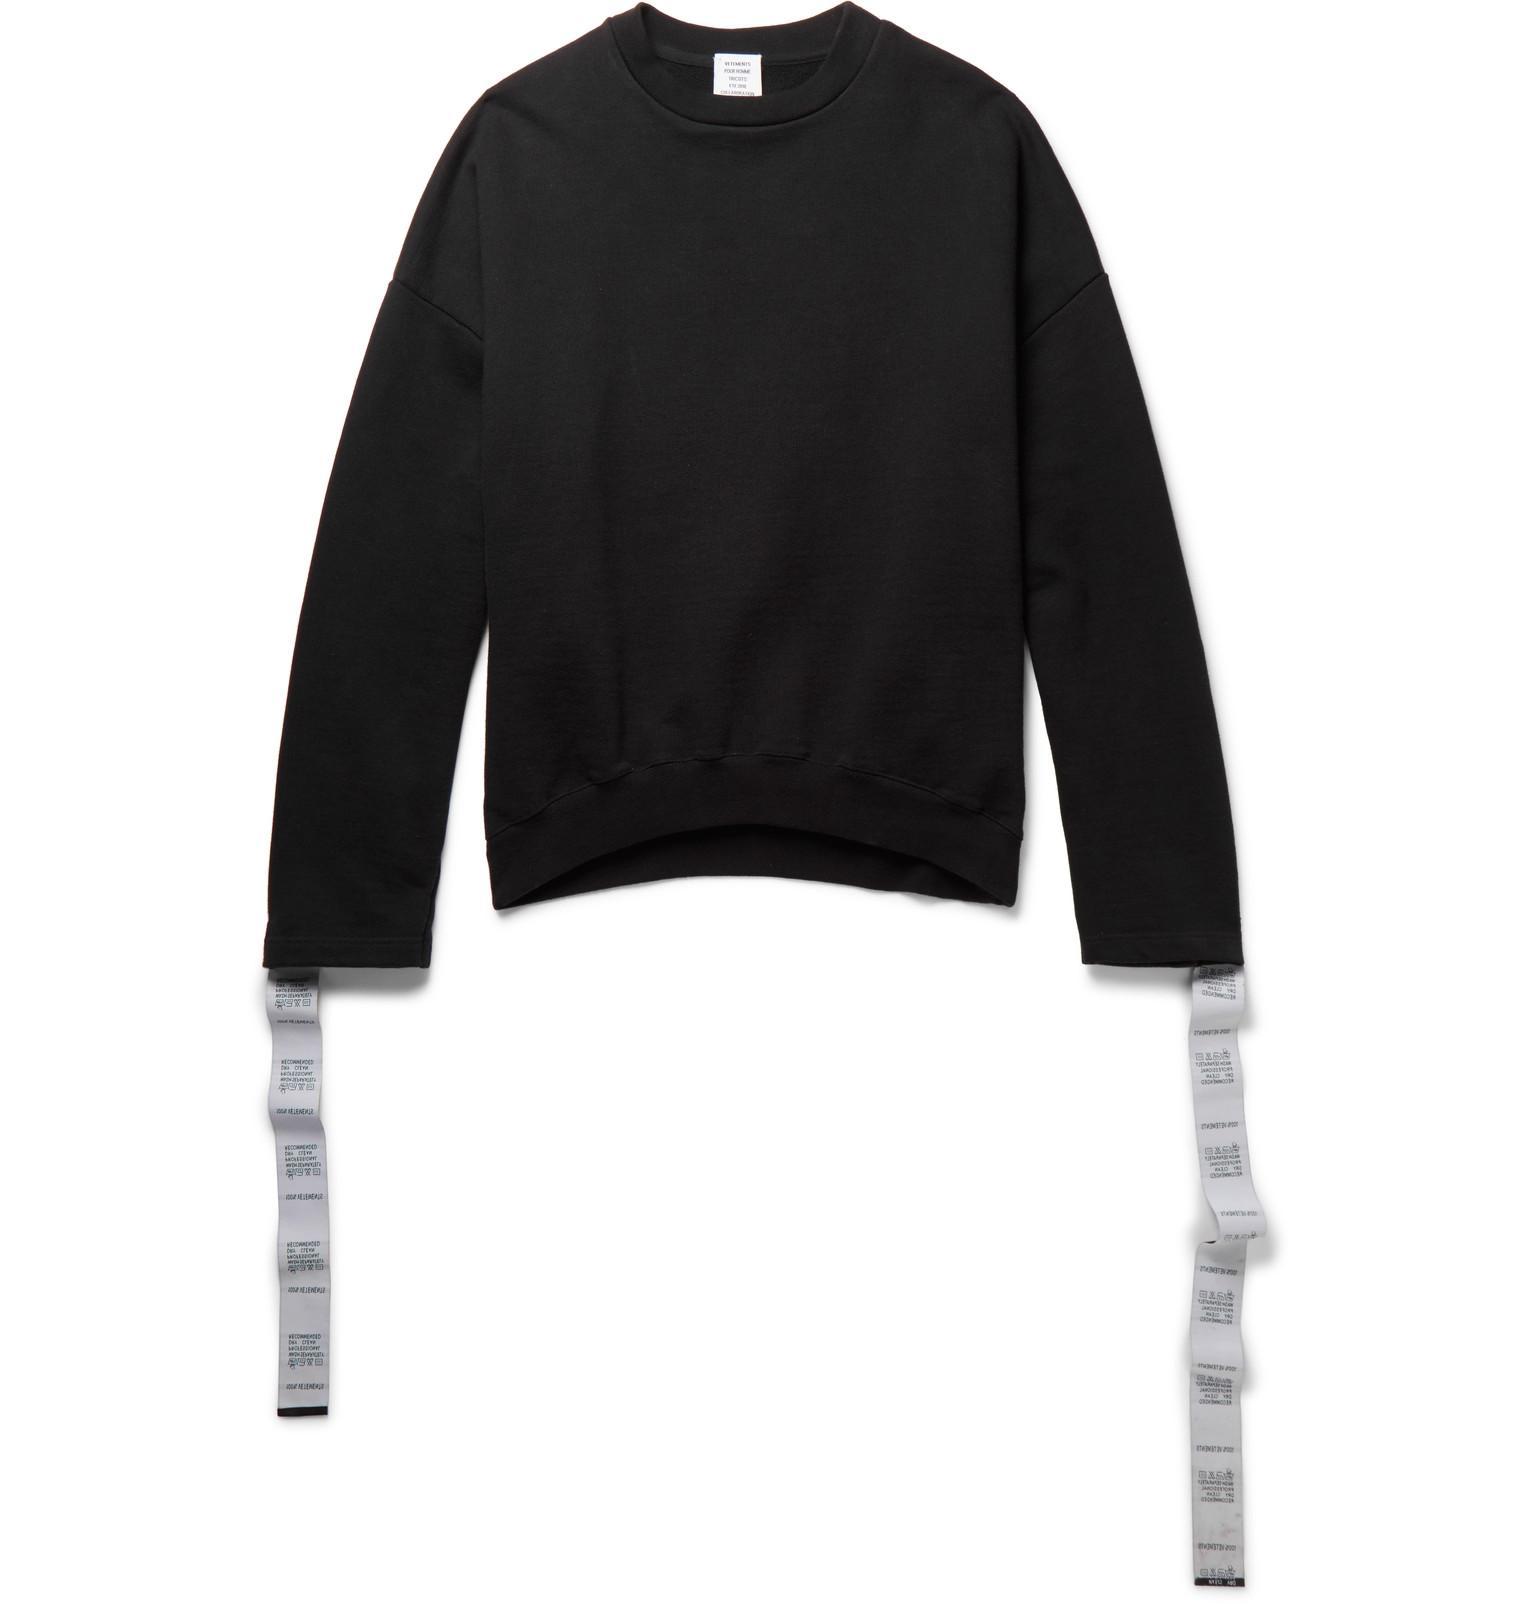 Black Tape Crewneck Sweatshirt VETEMENTS Popular And Cheap Discount Shop For Gv5RFvSA